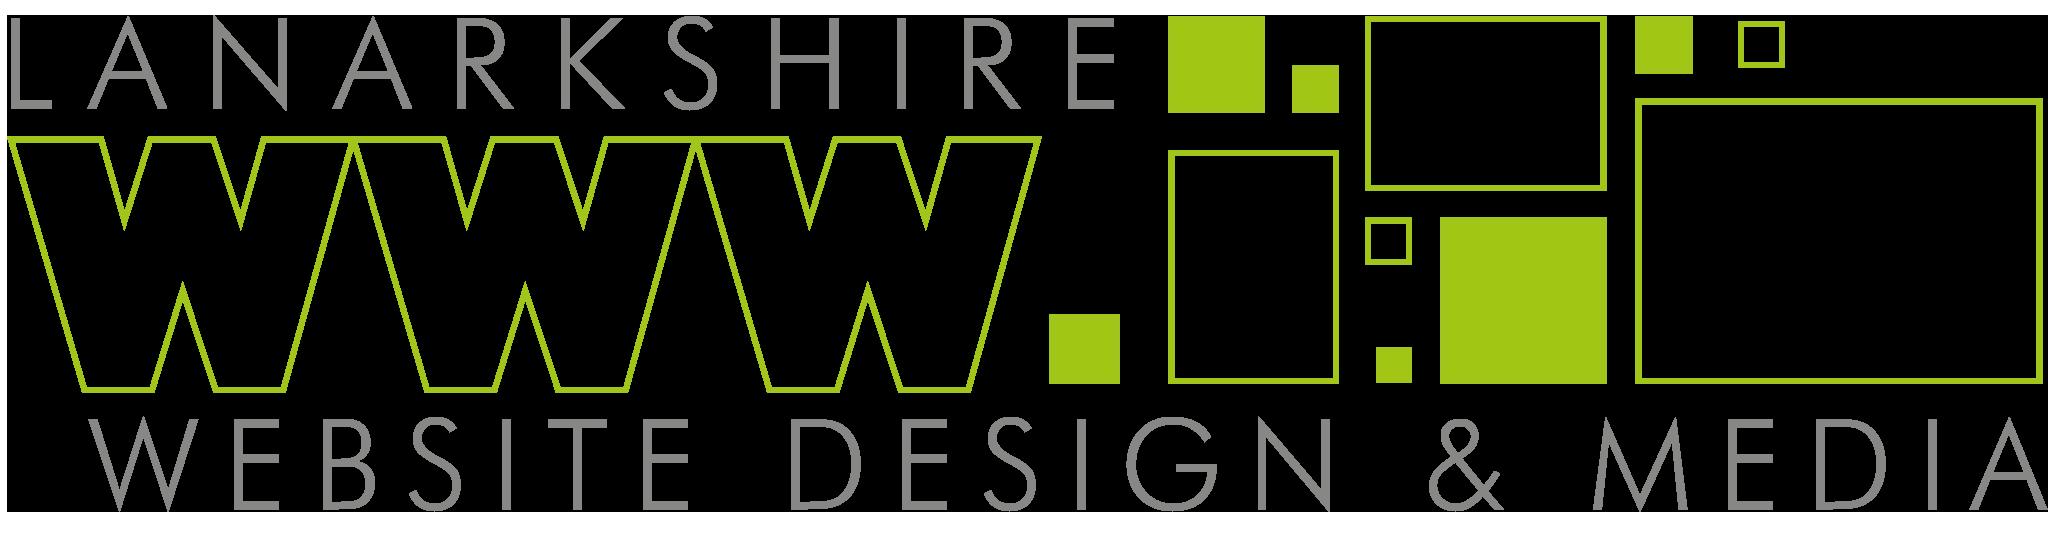 Website Design in Lanarkshire